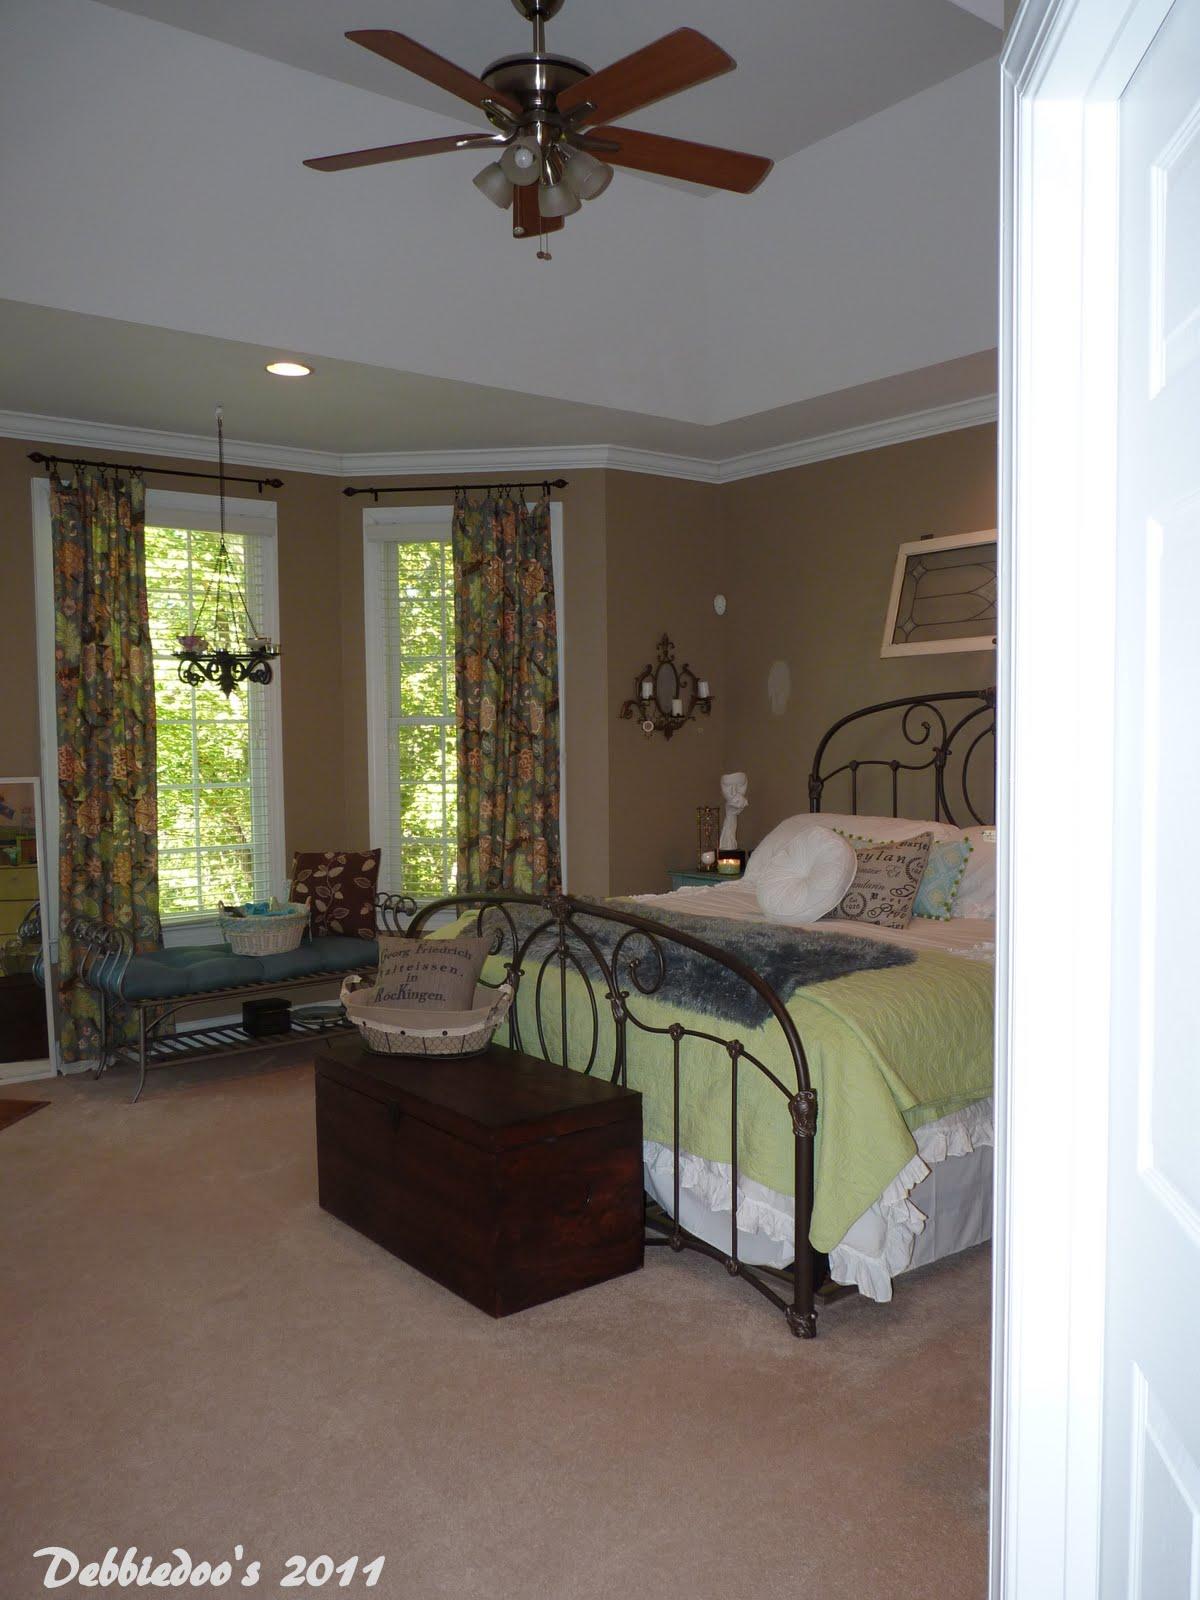 Debbiedoo's: Pottery Barn Inspired Master Bedroom {Shabby